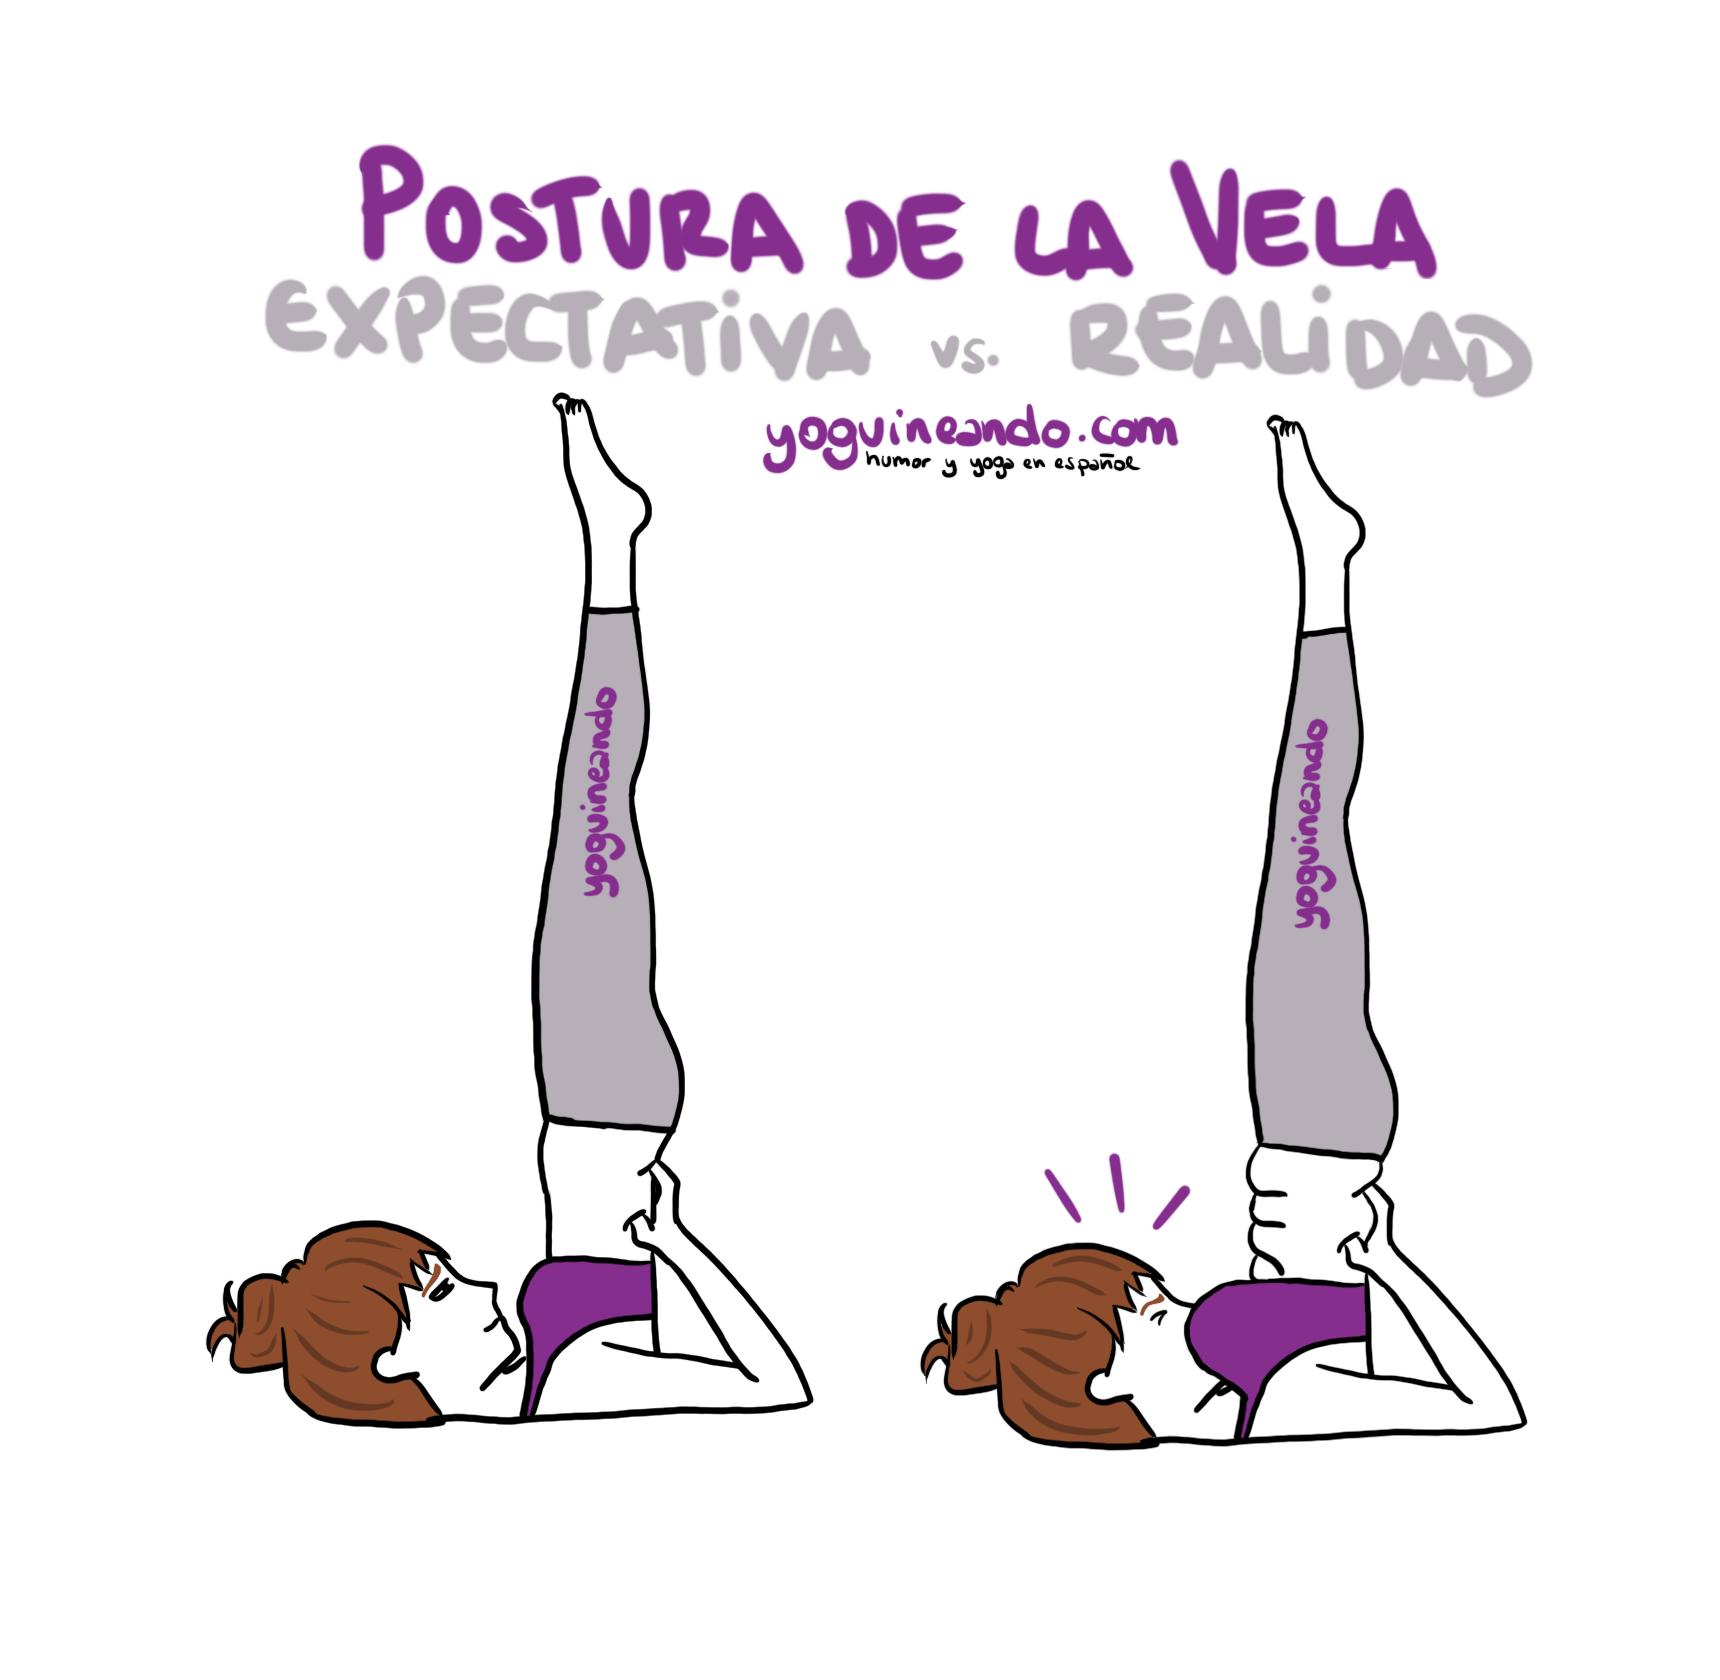 Sarvangasa O Postura De La Vela Expectativas Vs Realidad Yoguineando Yoga Divertida Posturas Básicas De Yoga Posturas De Yoga